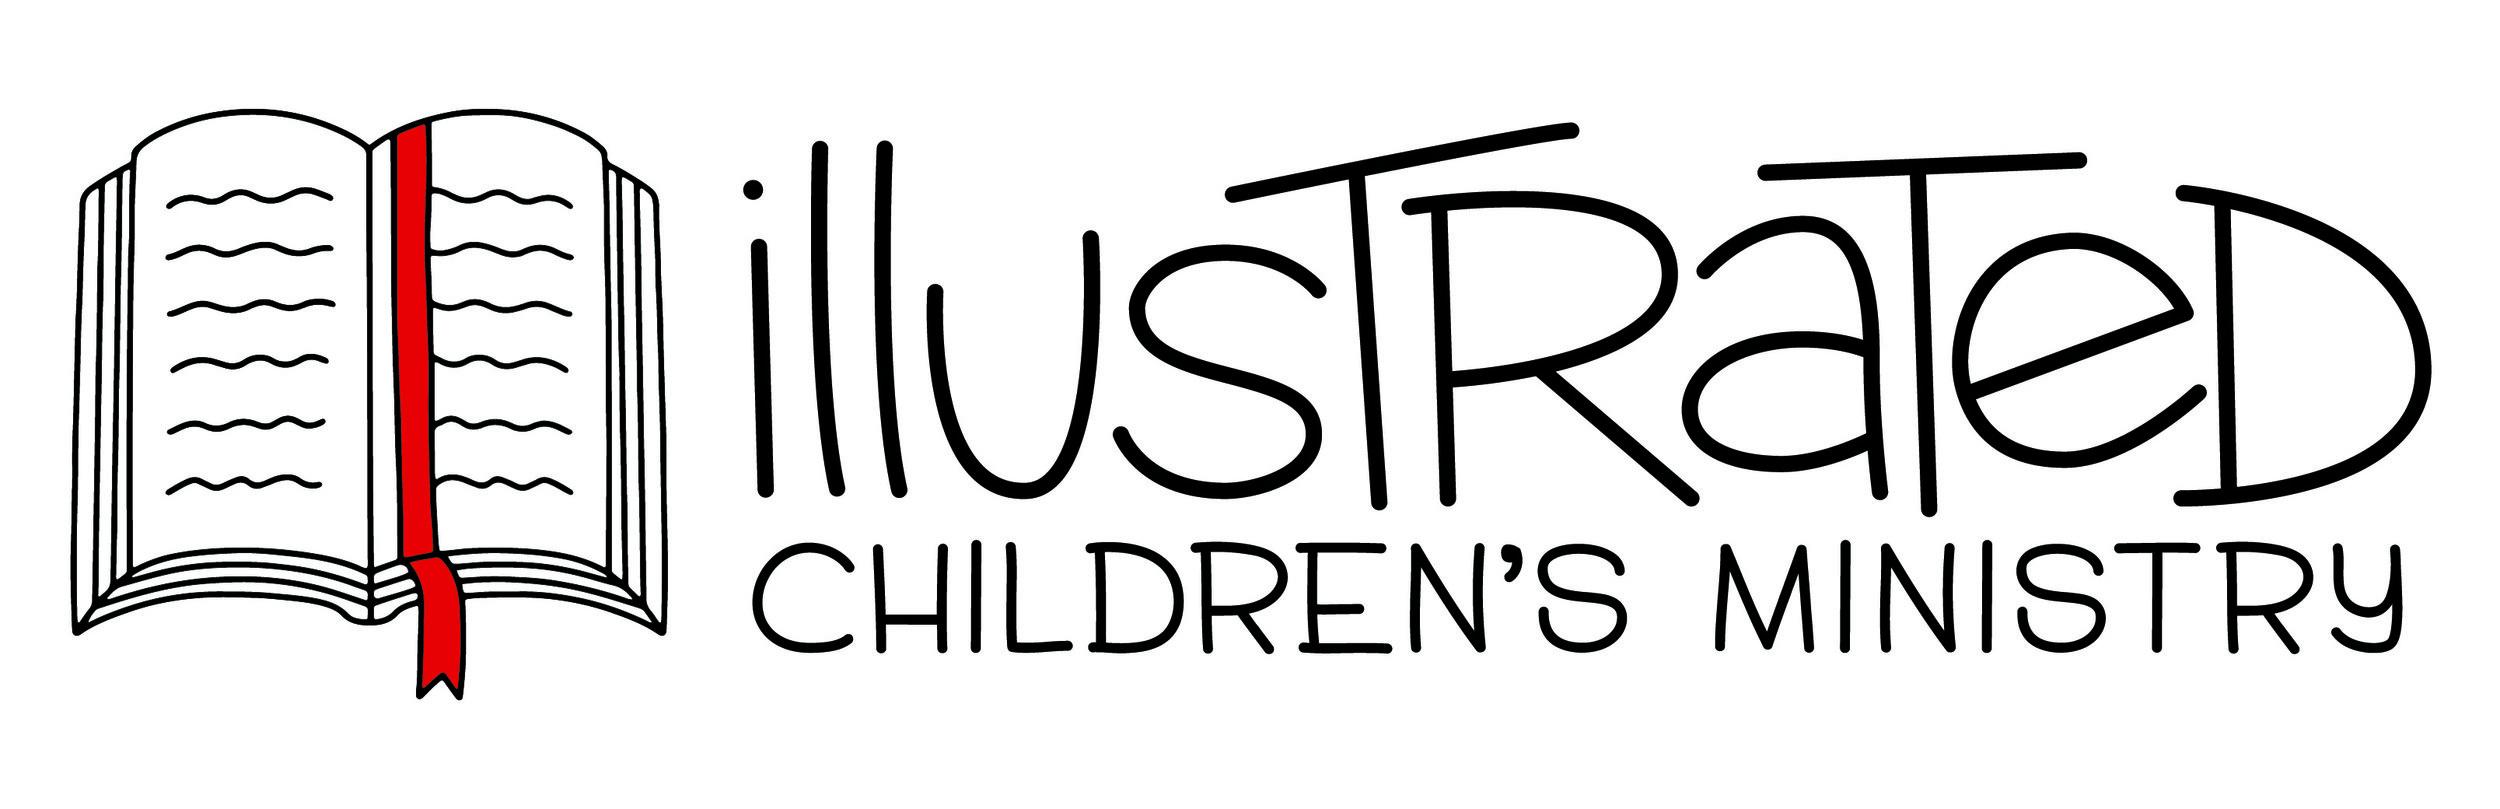 Illustrated Children's Ministry